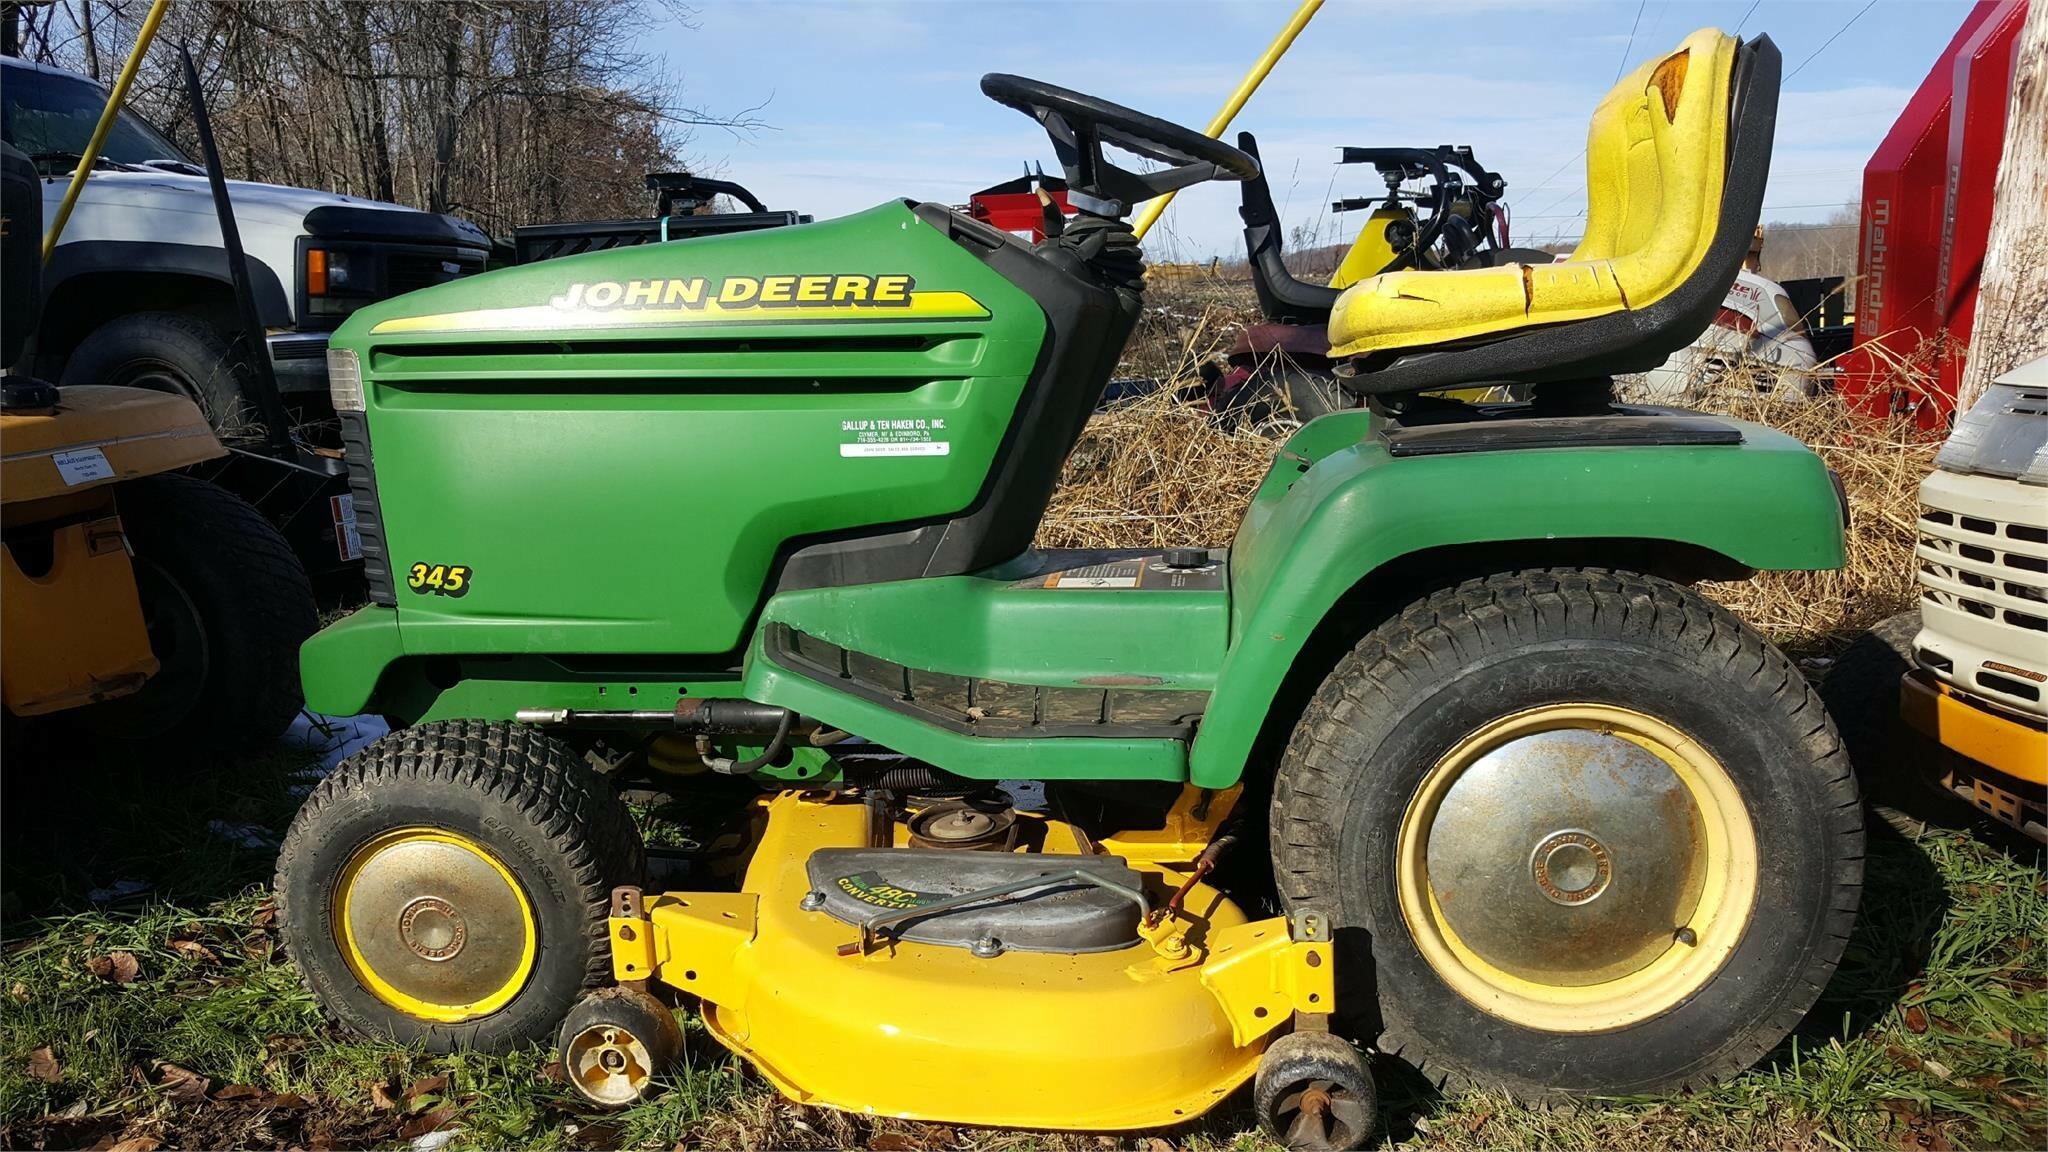 John Deere 345 Lawn and Garden